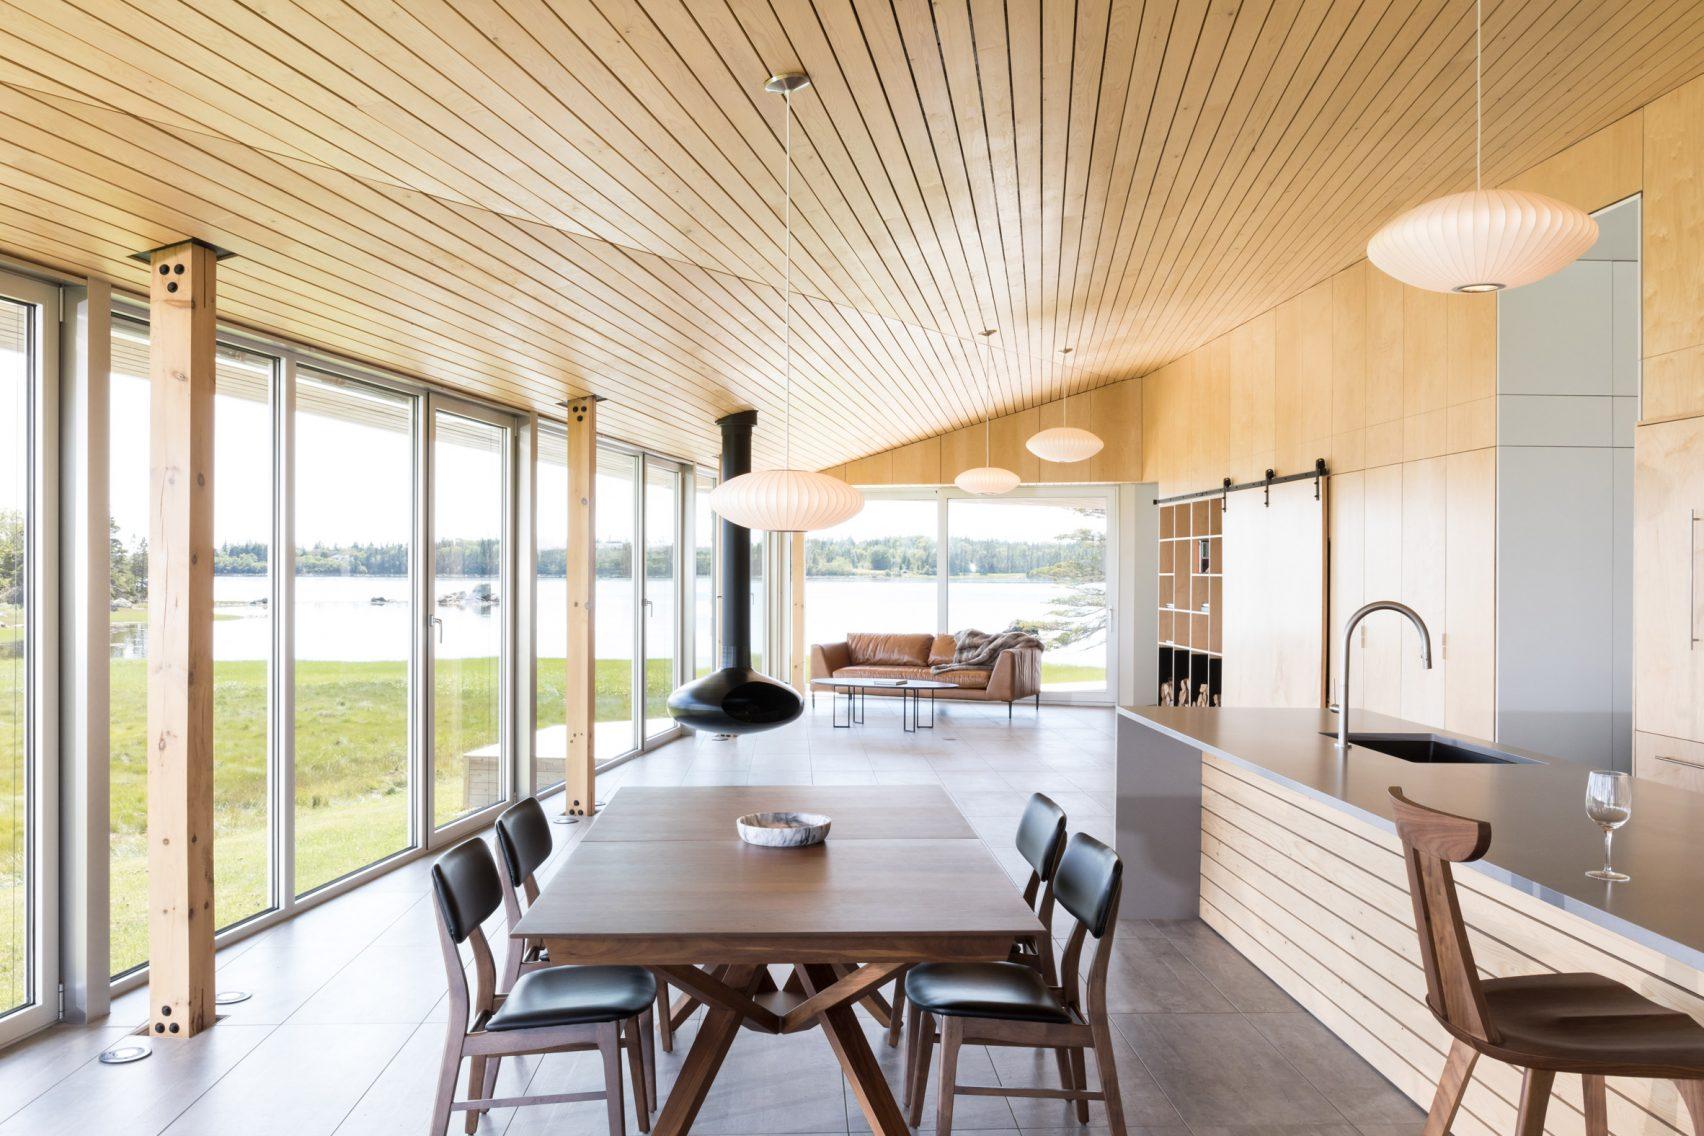 shingle style goes modern in nova scotia beach home curbed. Black Bedroom Furniture Sets. Home Design Ideas